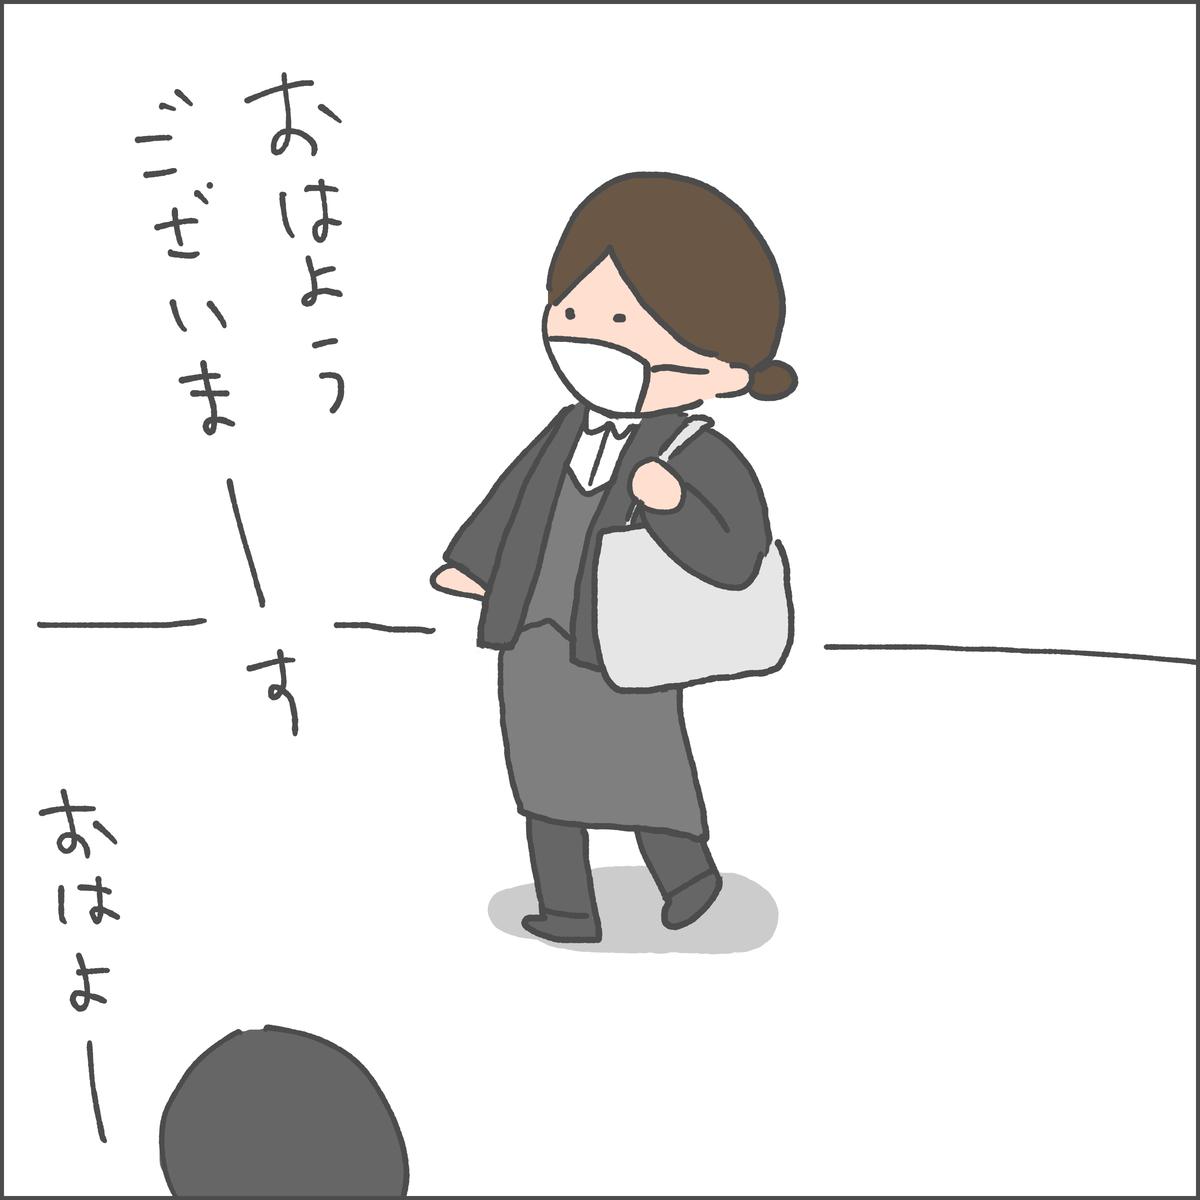 f:id:ika_yoshi:20210417235723j:plain